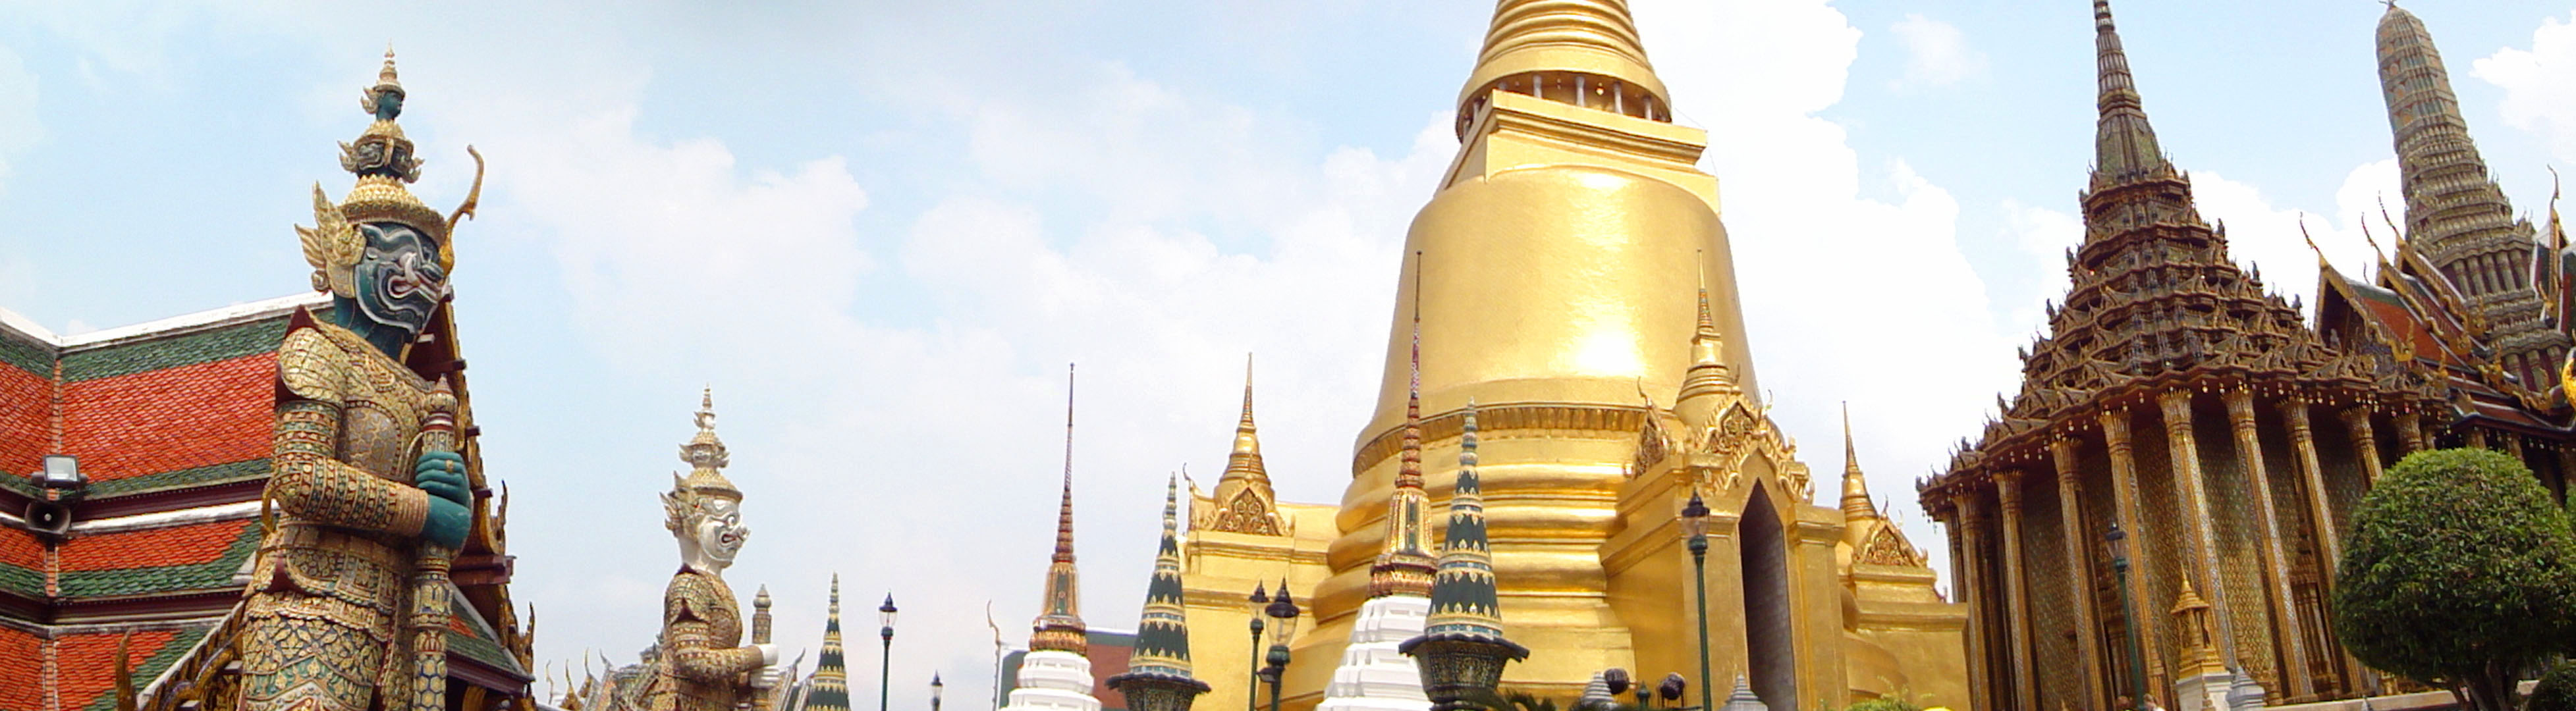 03 Phra Siratana Chedi Grand Palace Bangkok 2010 04